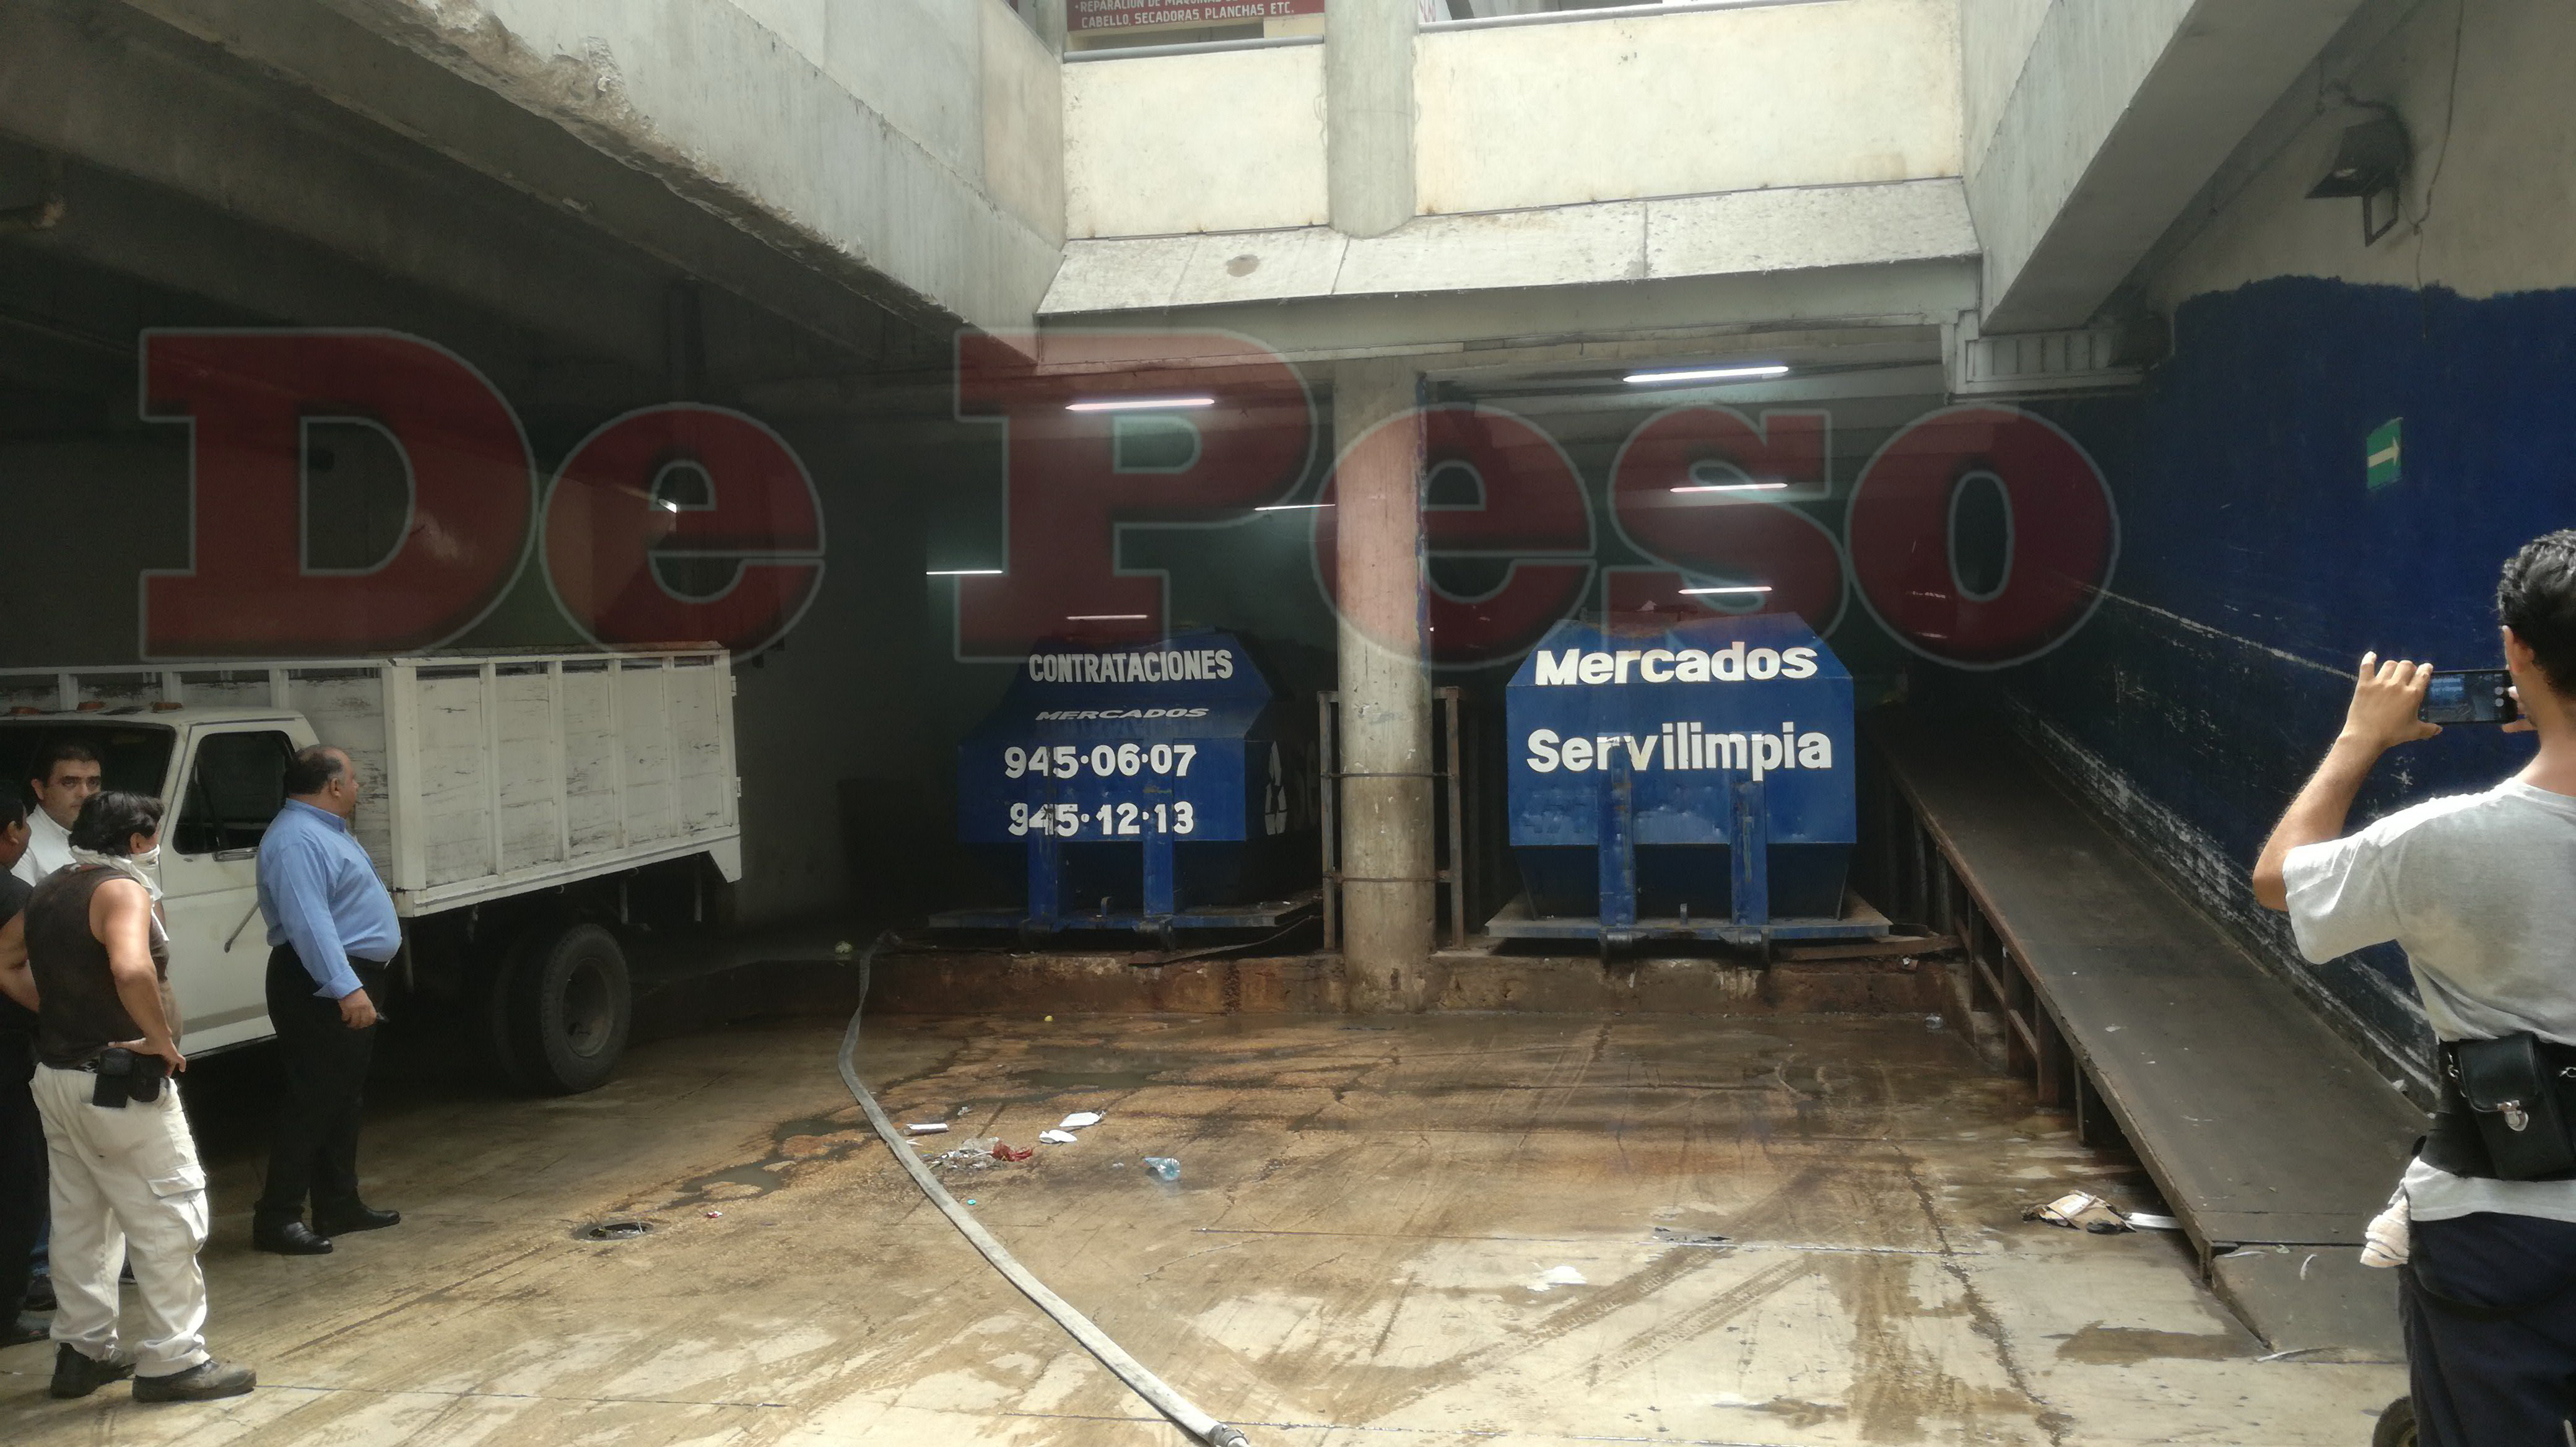 evacuación de Mercado de San Benito por gases tóxicos